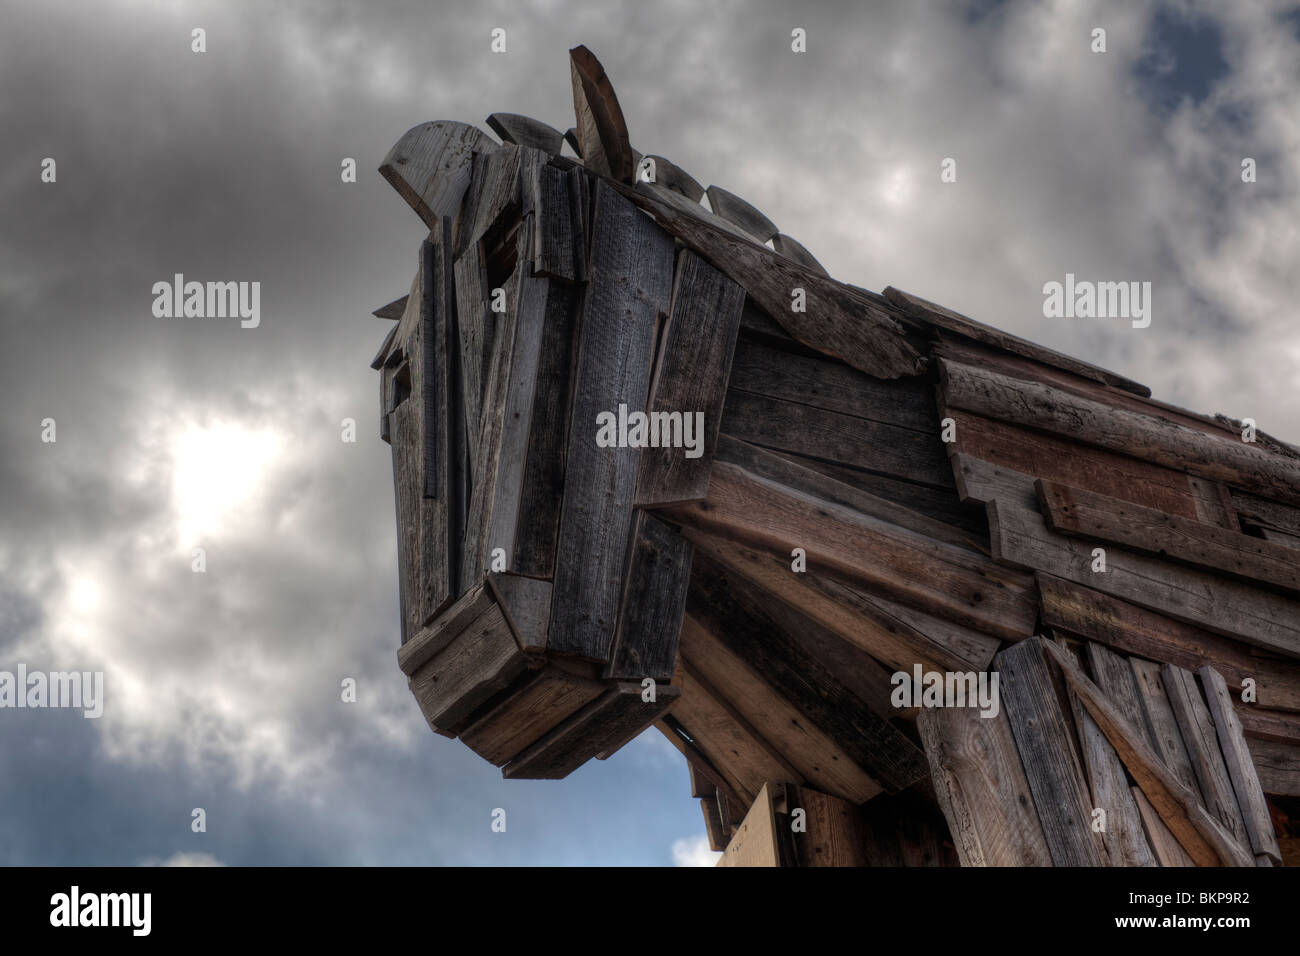 Trojan horse - Stock Image